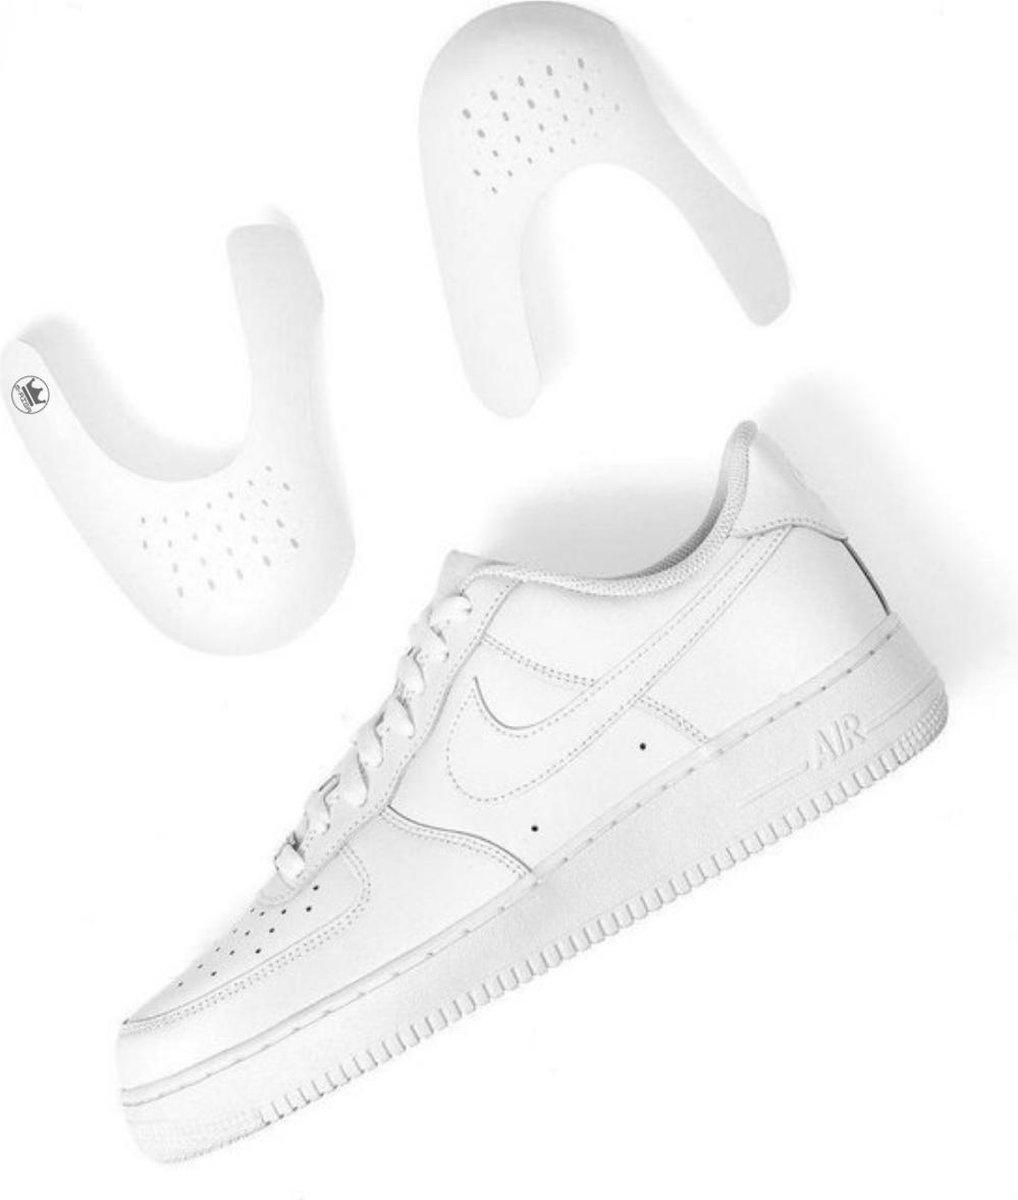 Crease Protector - No Crease Sneaker Shield - (Maat 40 t/m 45) Anti Crease - Anti Kreuk